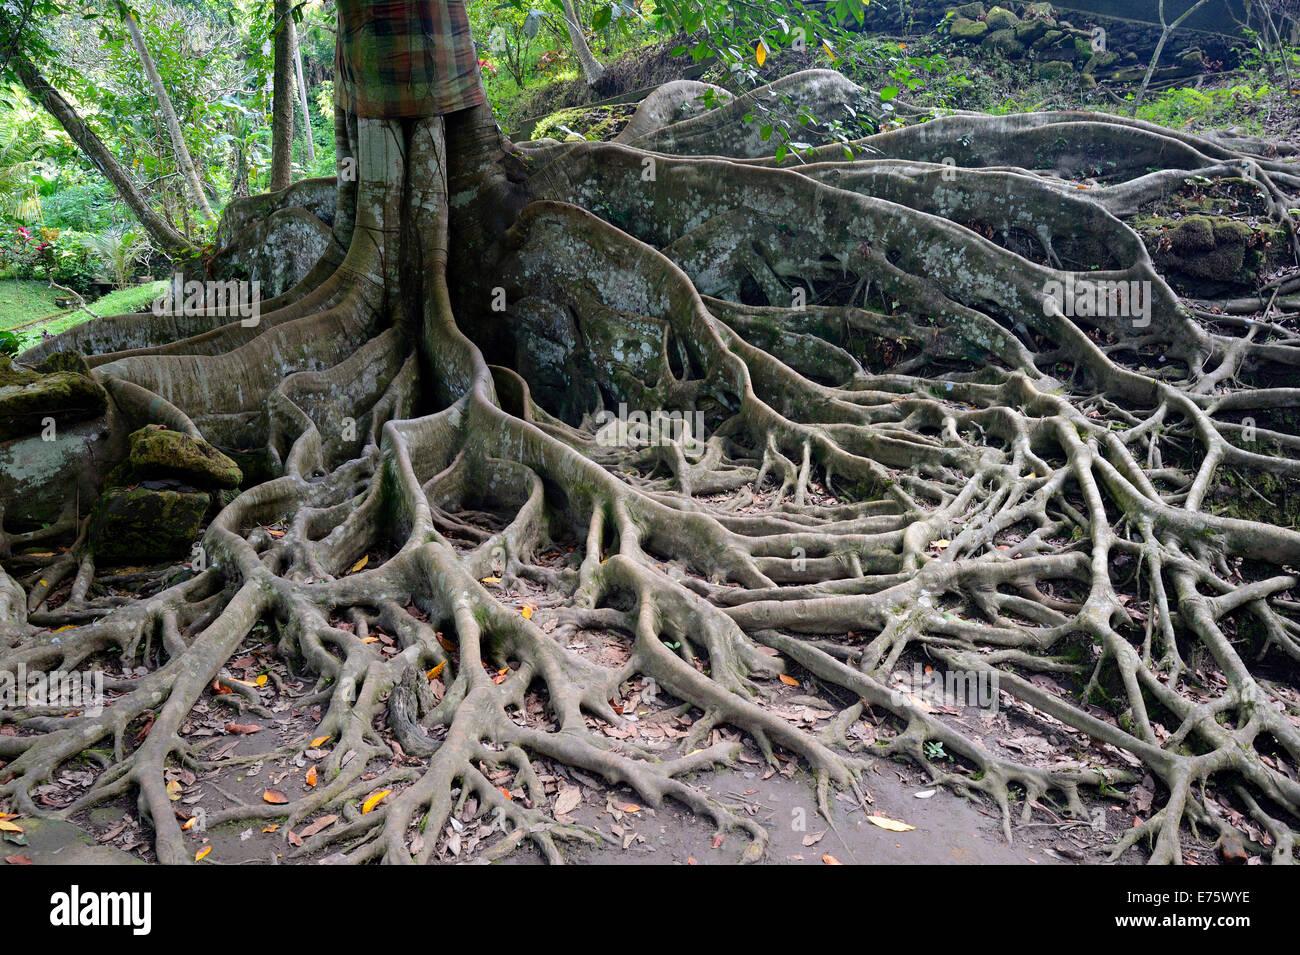 ficus tree stock photos ficus tree stock images alamy. Black Bedroom Furniture Sets. Home Design Ideas